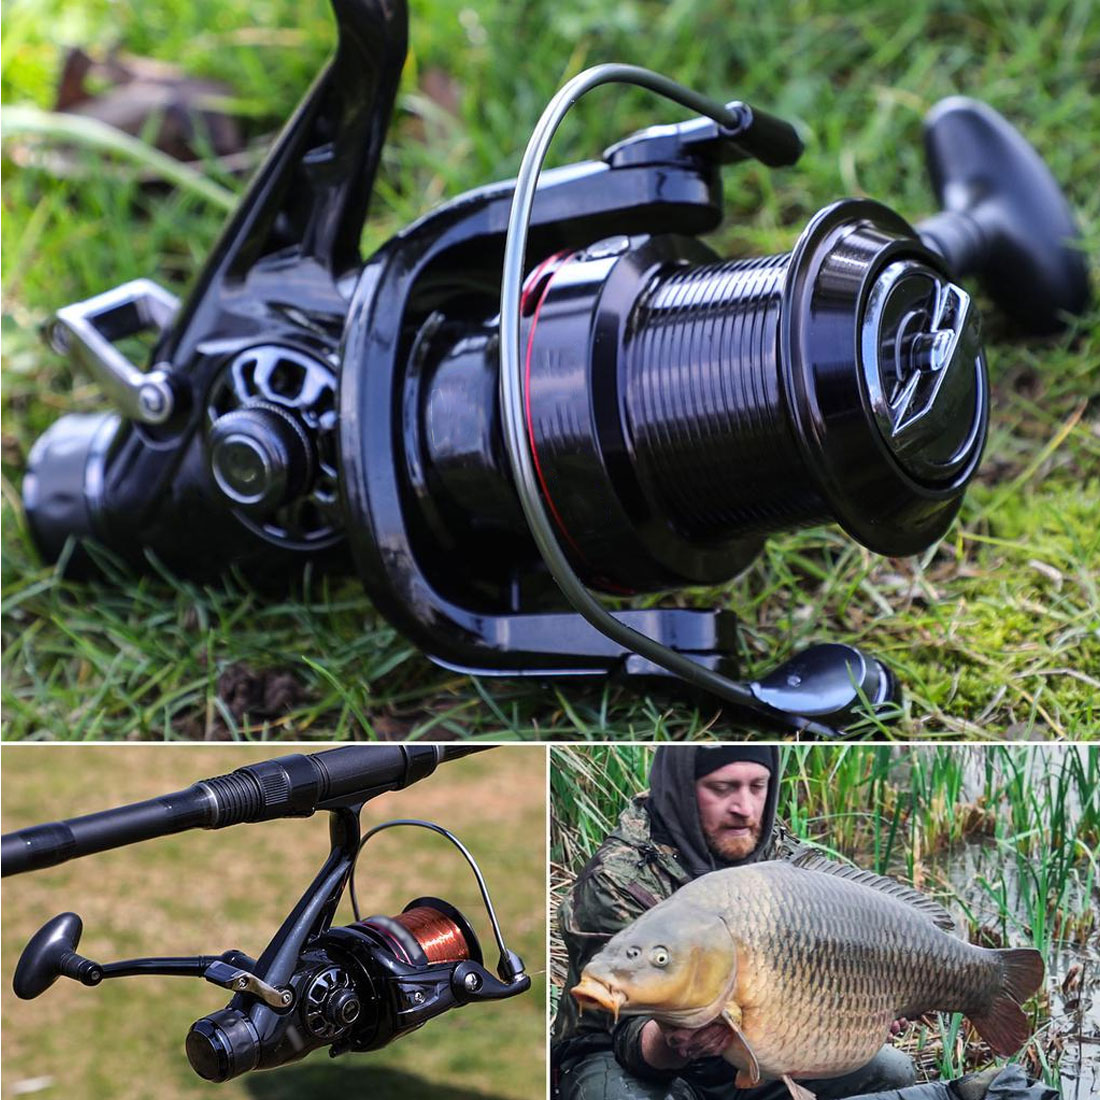 Professional Fishing Wheel 12 BB Series 5.1:1 3000-7000 Speed Spinning Fishing Reel Interchanged Left/right Hand Wheel